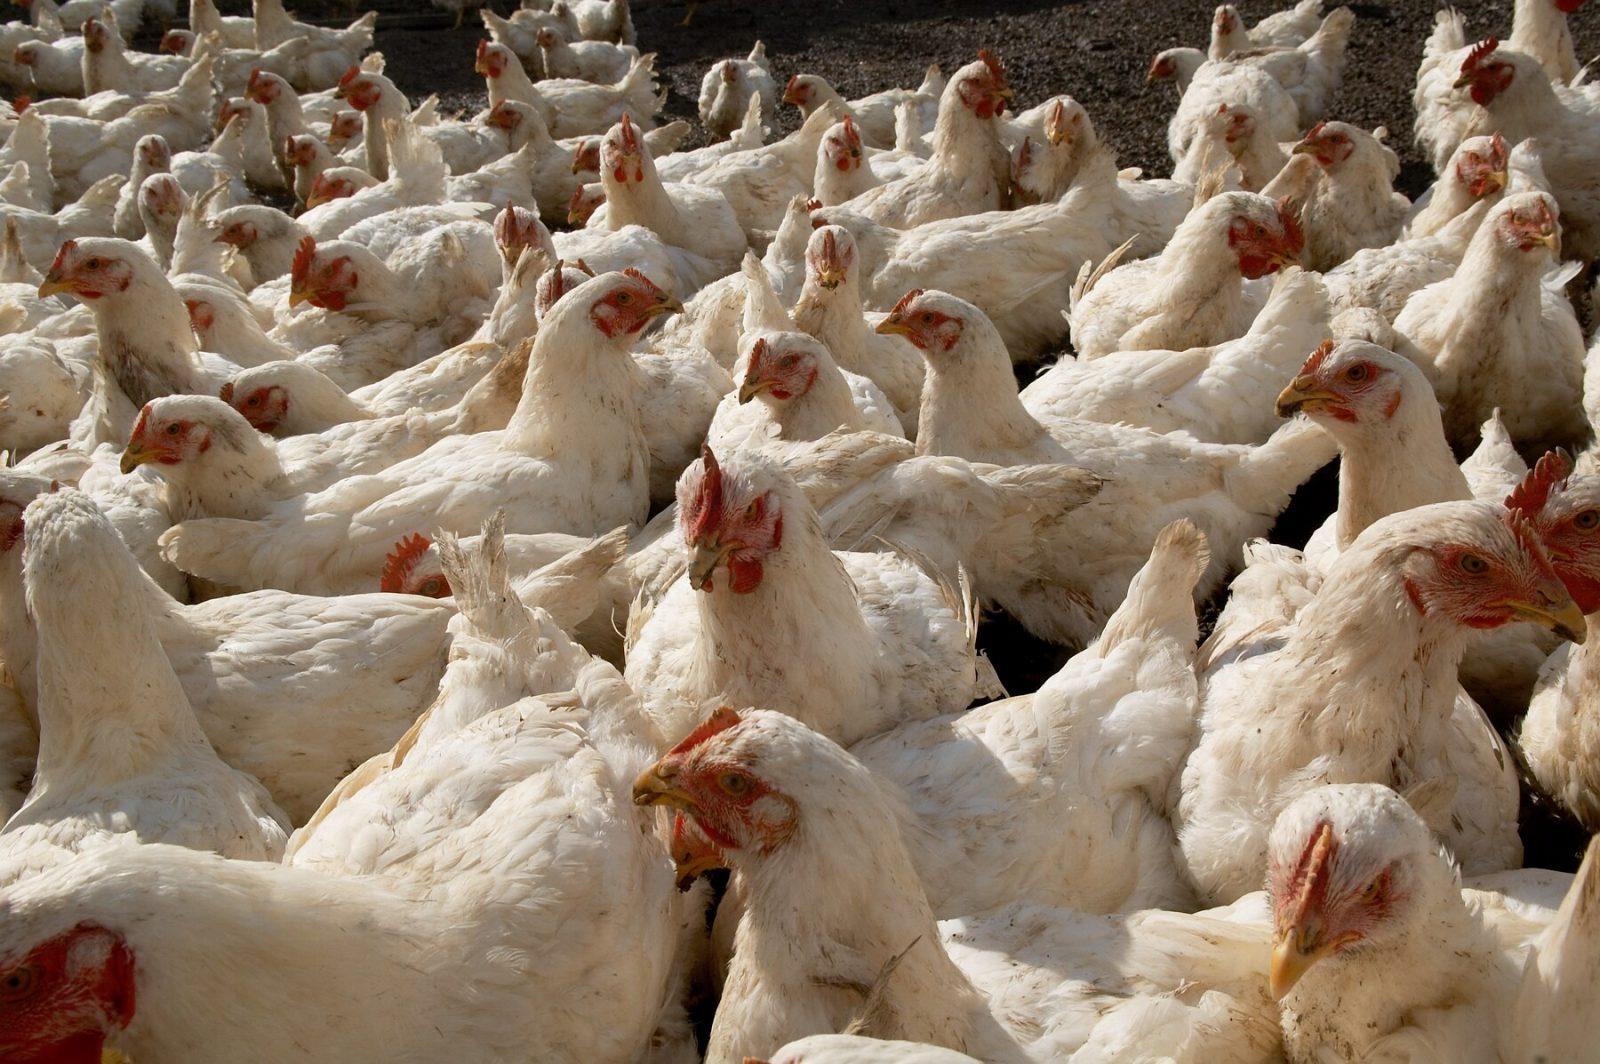 Chickens at Farm Sanctuary